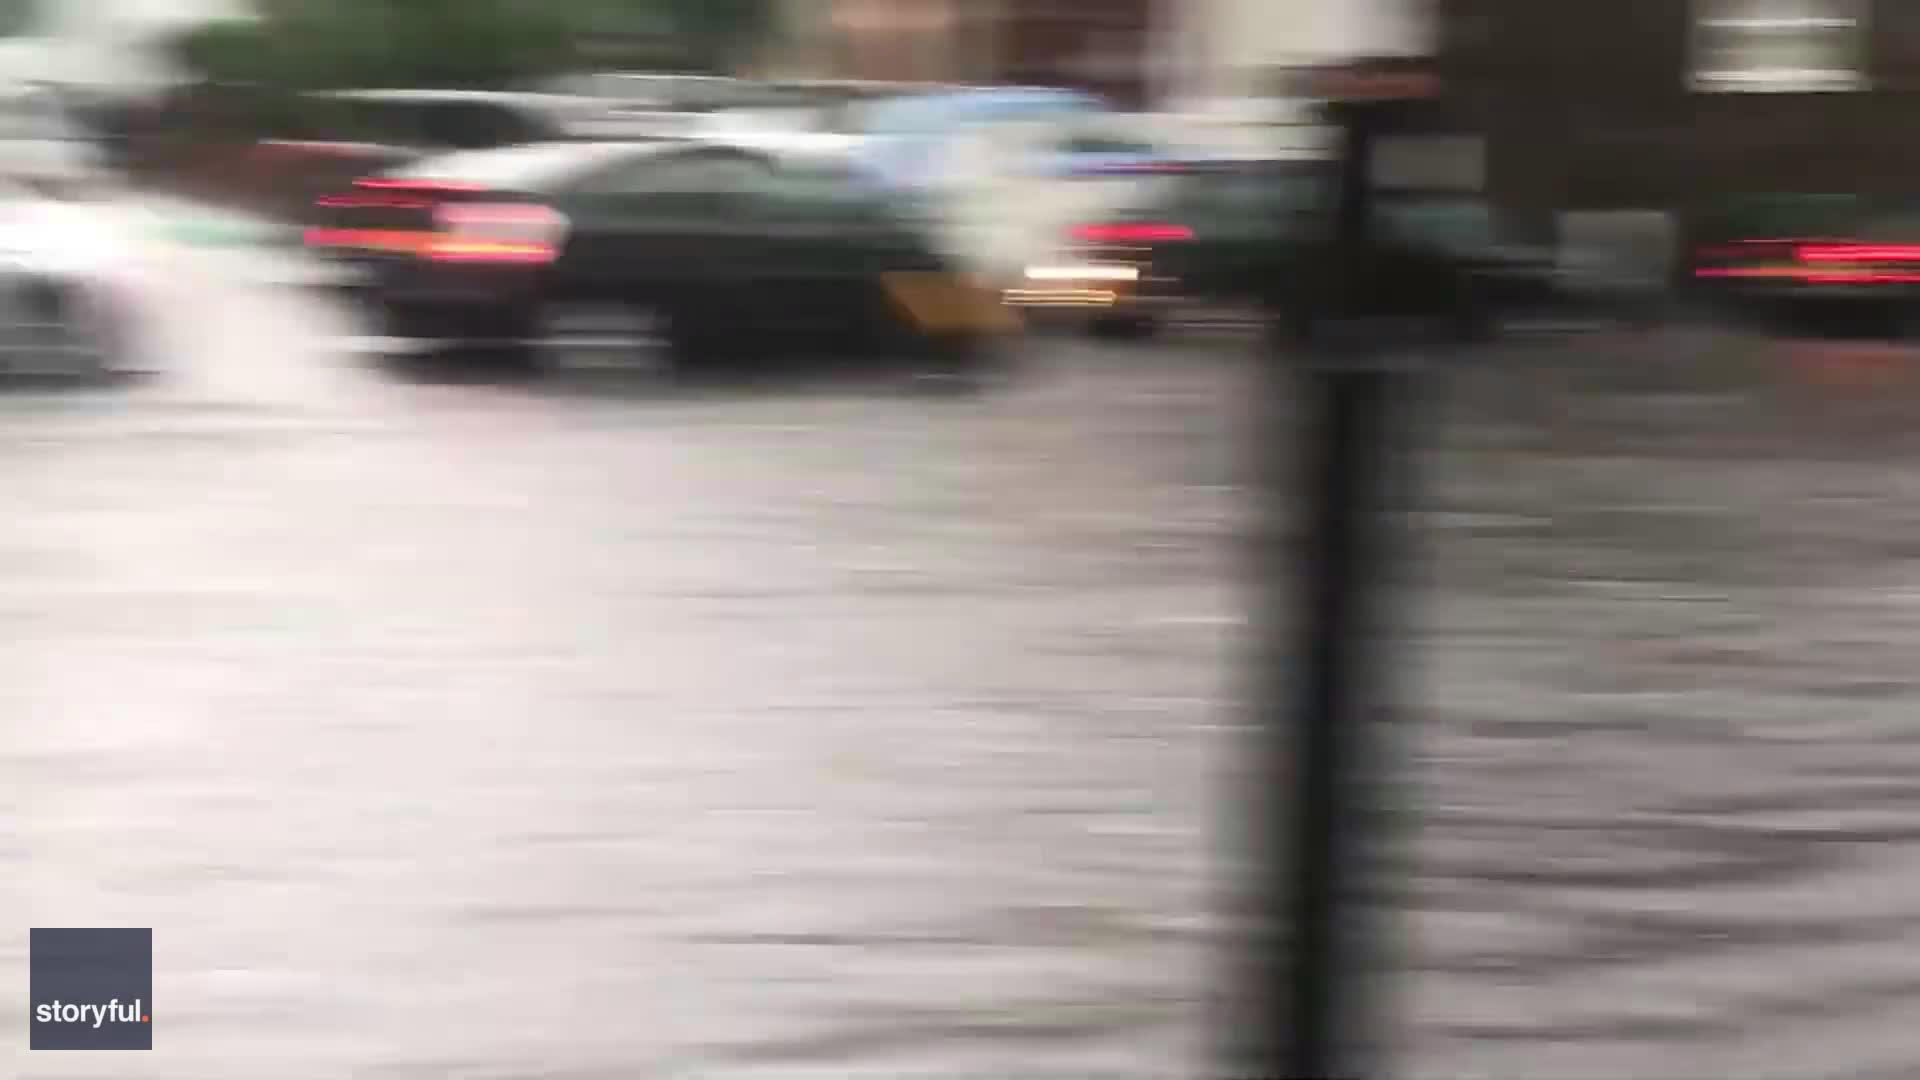 london flooding - photo #15